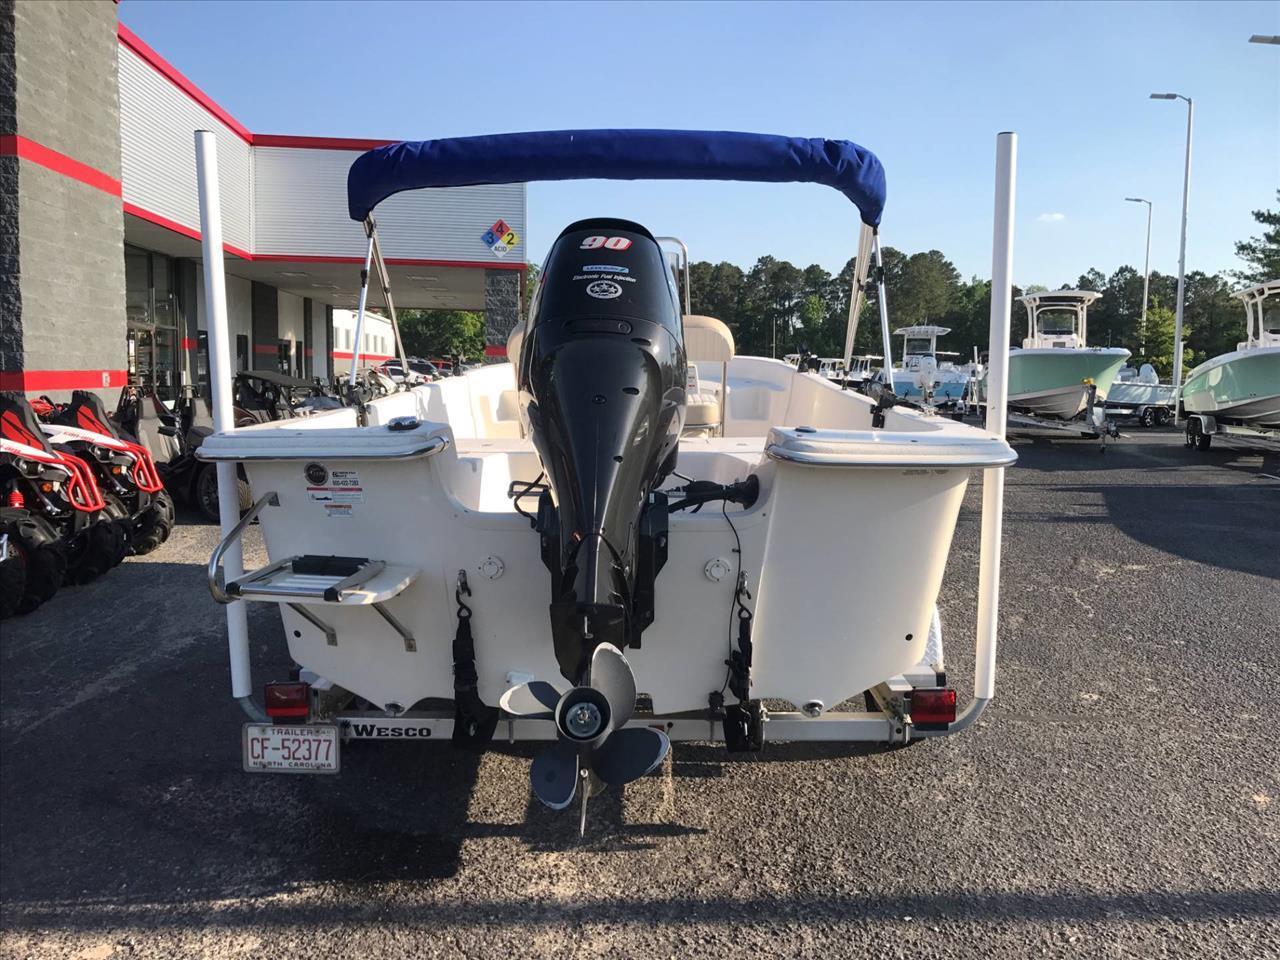 2015 Carolina Skiff 198 DLV for sale at Vehicle Network, LLC - Performance East, INC. in Goldsboro NC